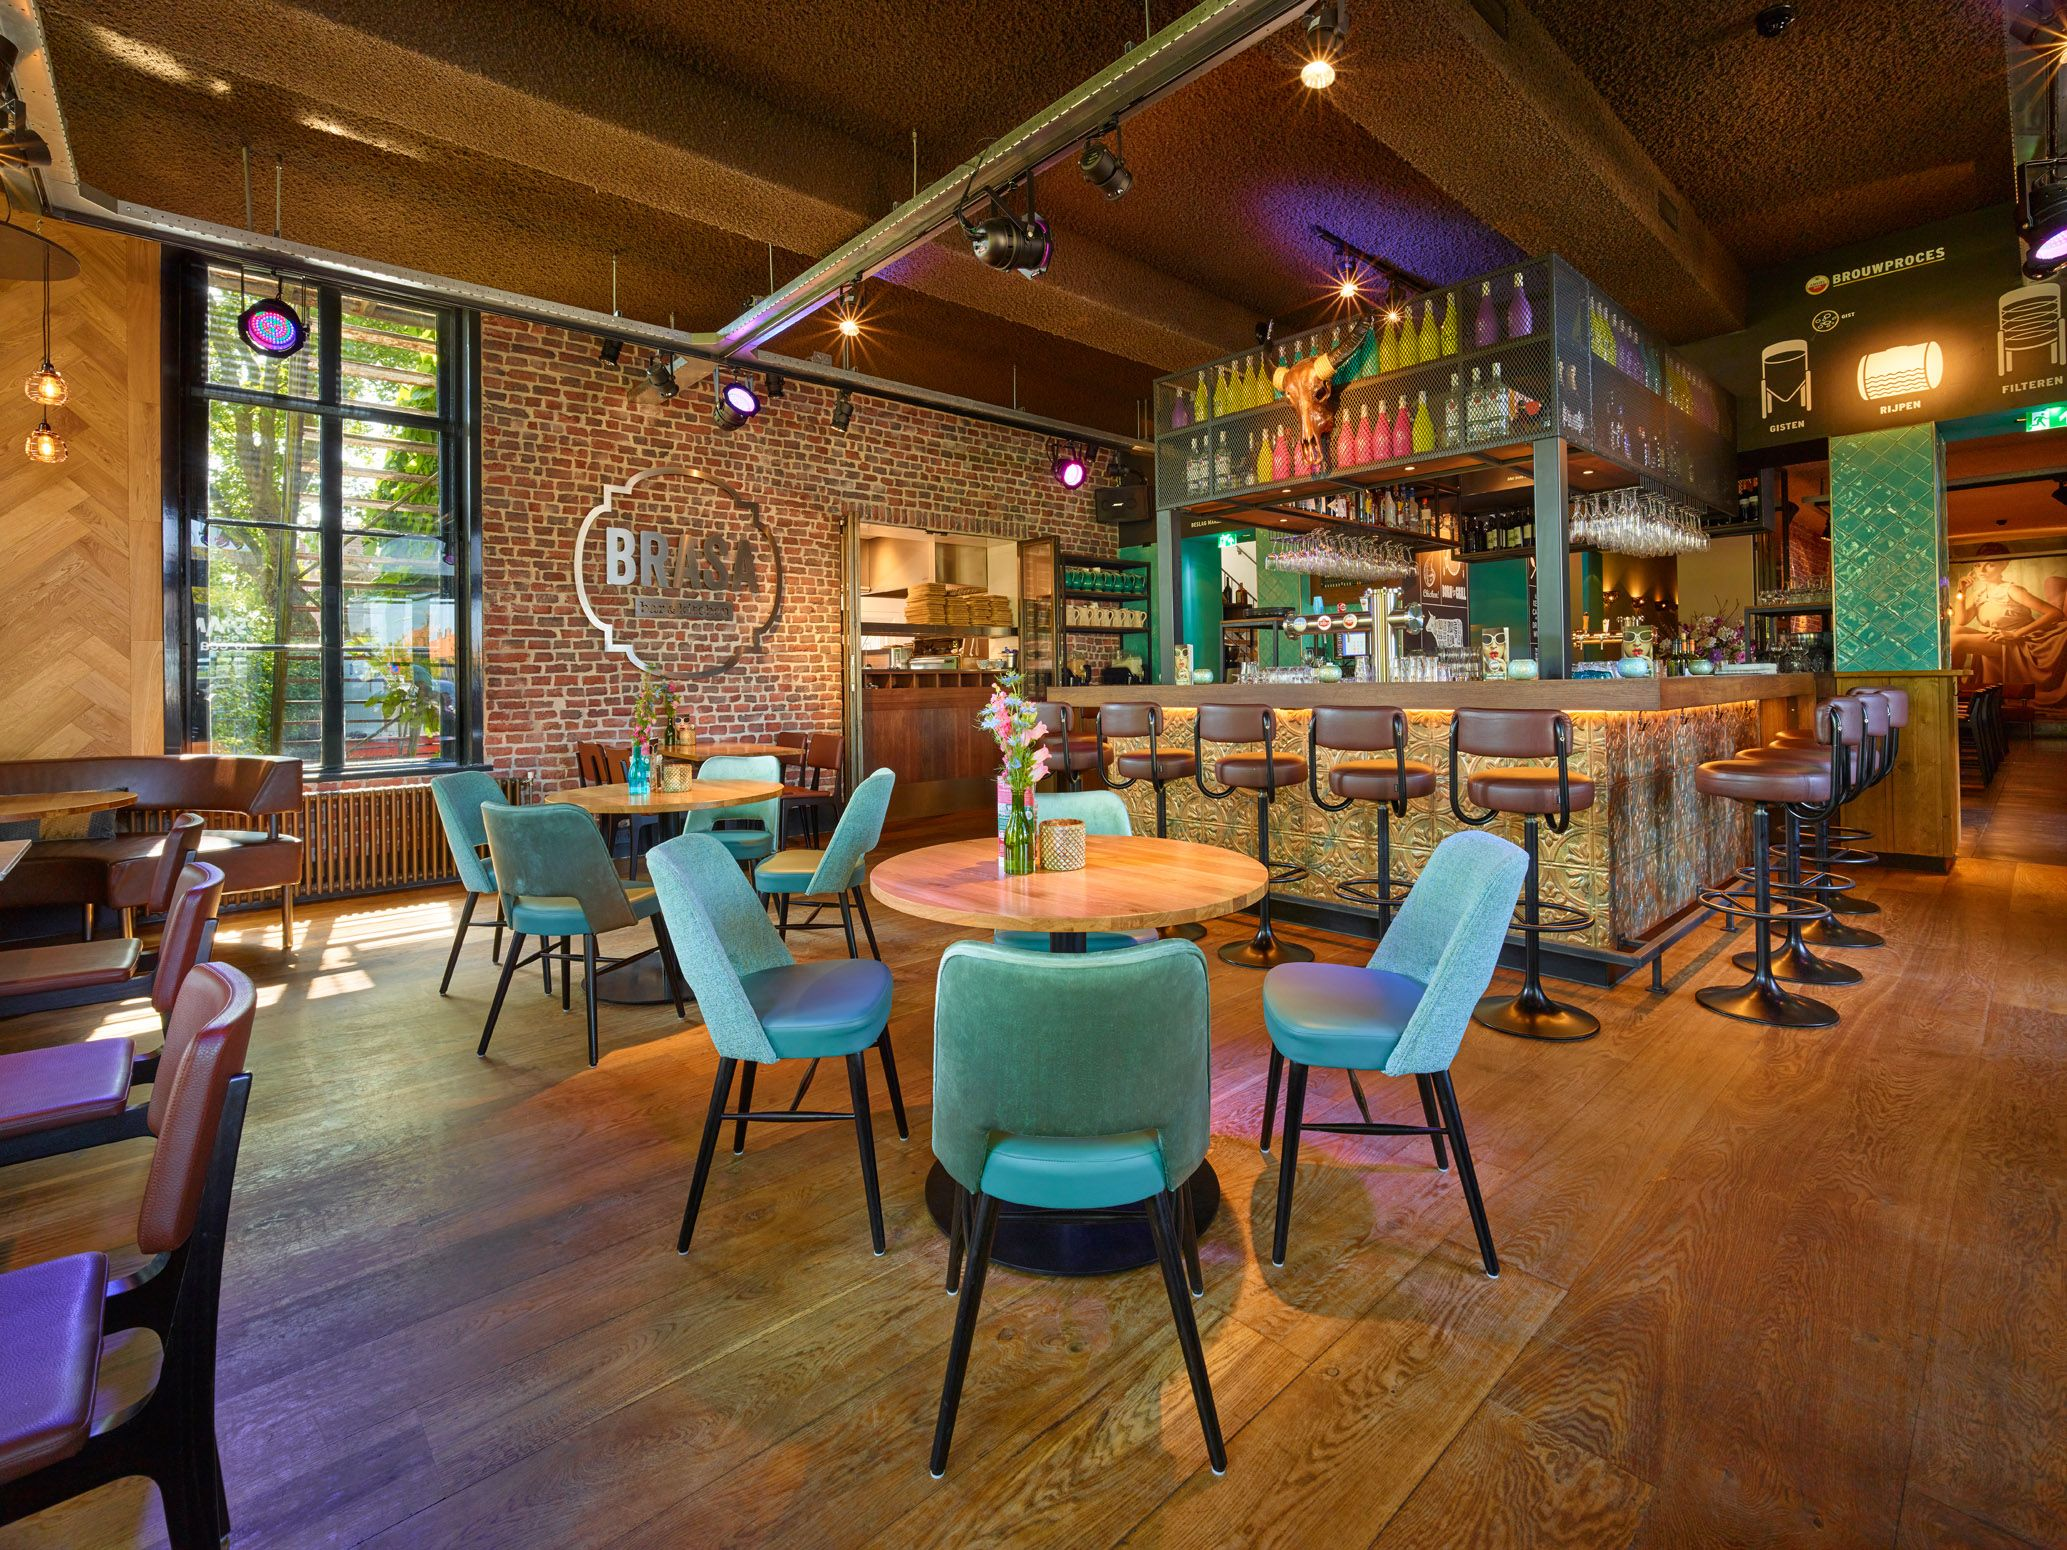 Brasa Beemster  Bar & Kitchen, Middenbeemster